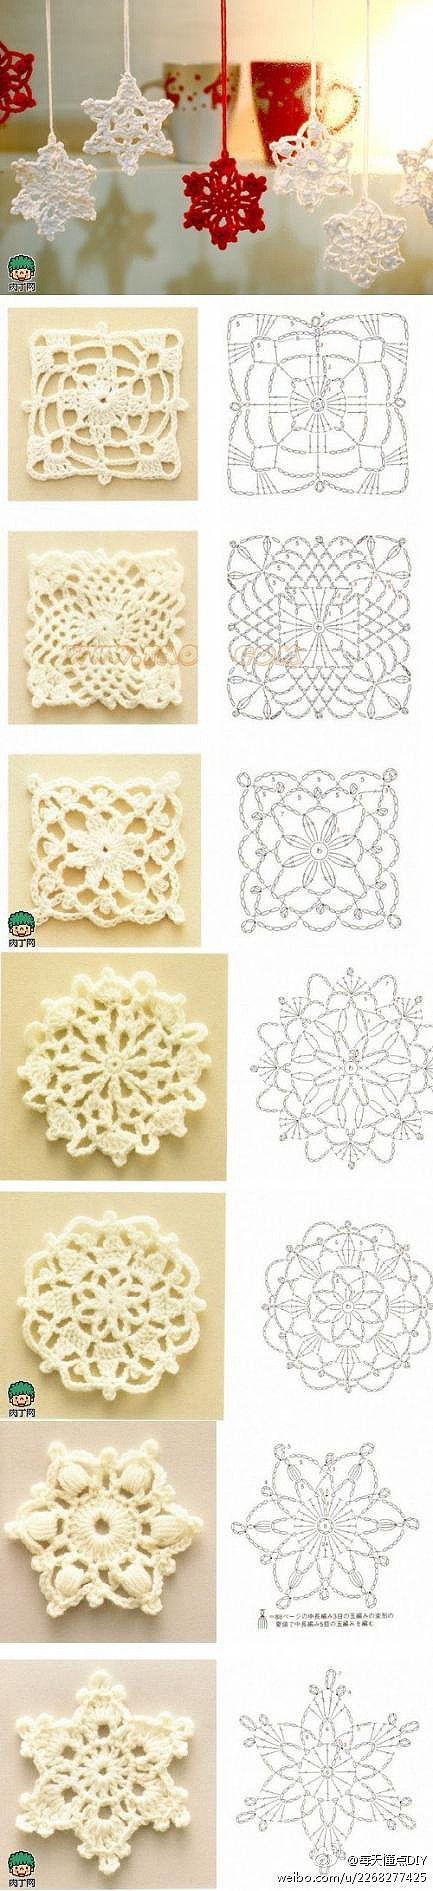 Snowflakes crochet patterns - Patrones de ganchillo copos de nieve